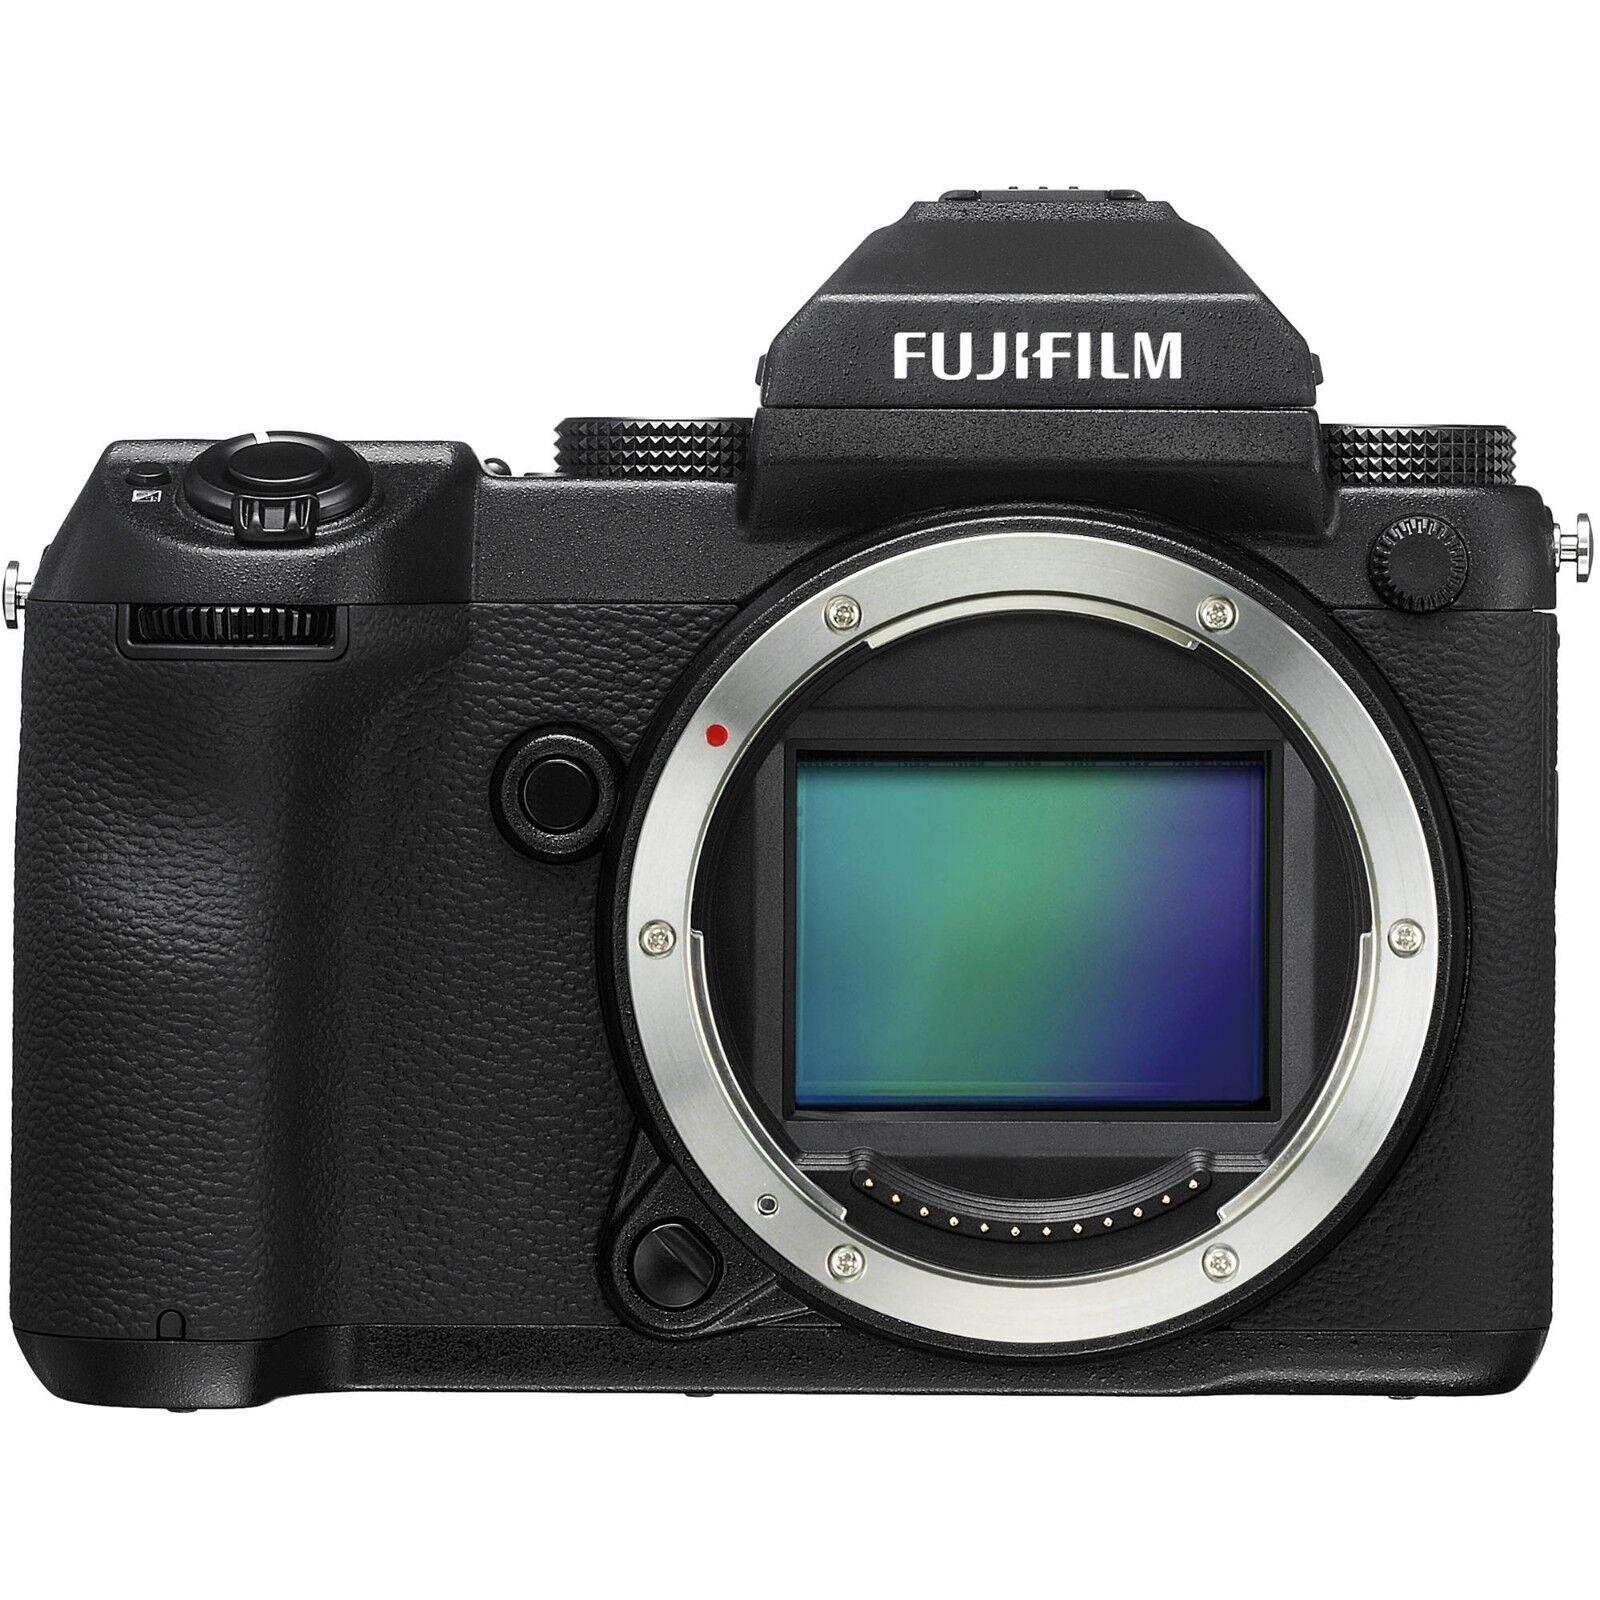 Fujifilm HD Wi-Fi GFX 50S Medium Format Digital Camera Body